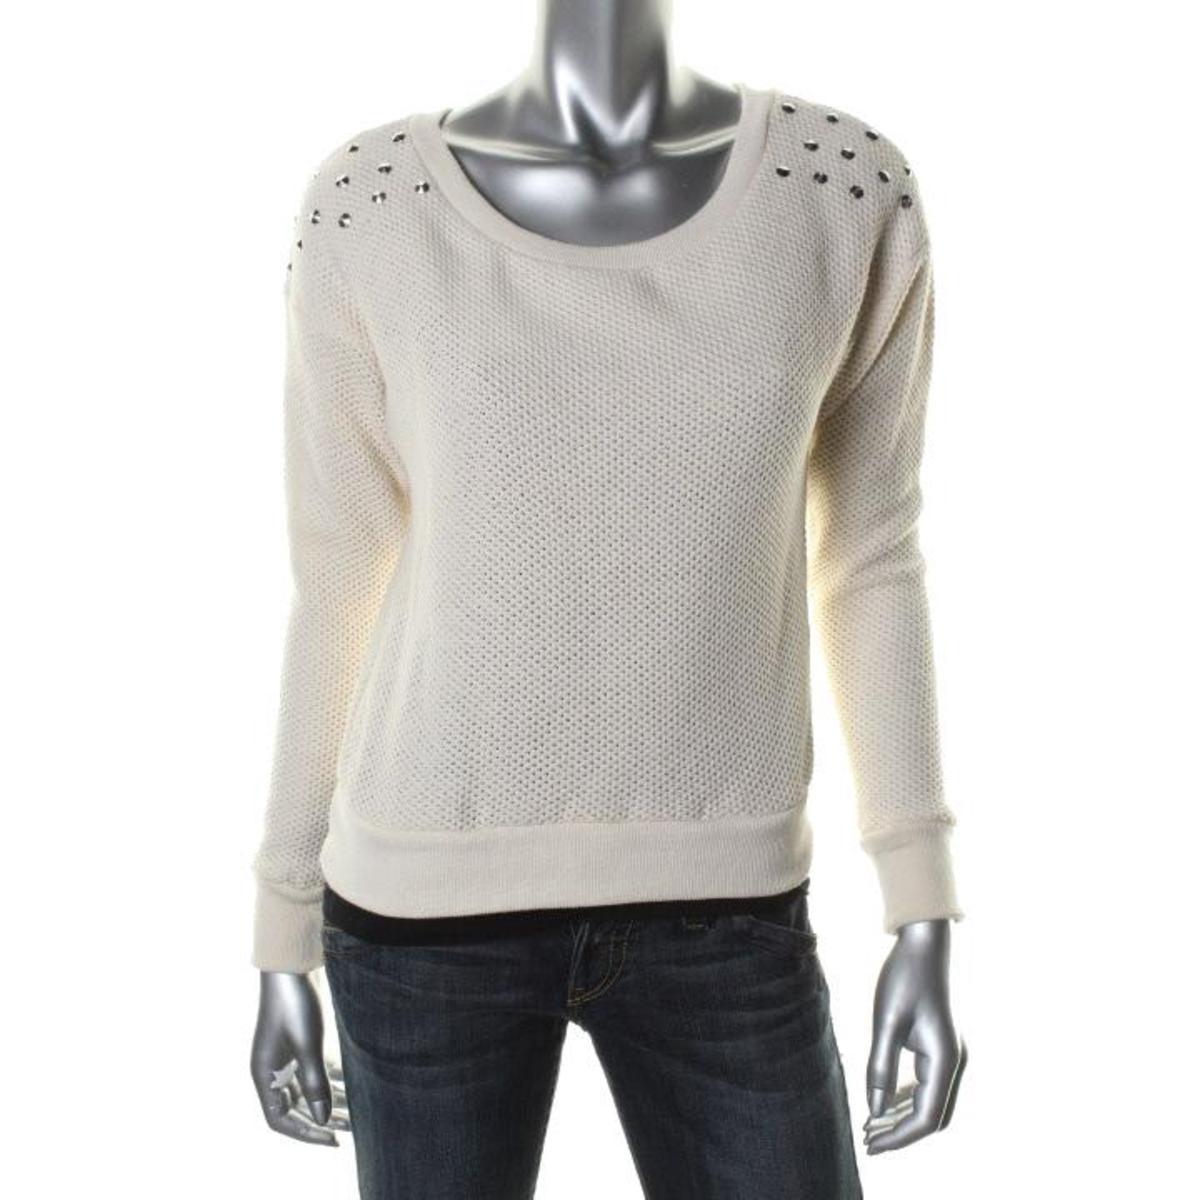 Fang Juniors Cotton Studded Knit Top